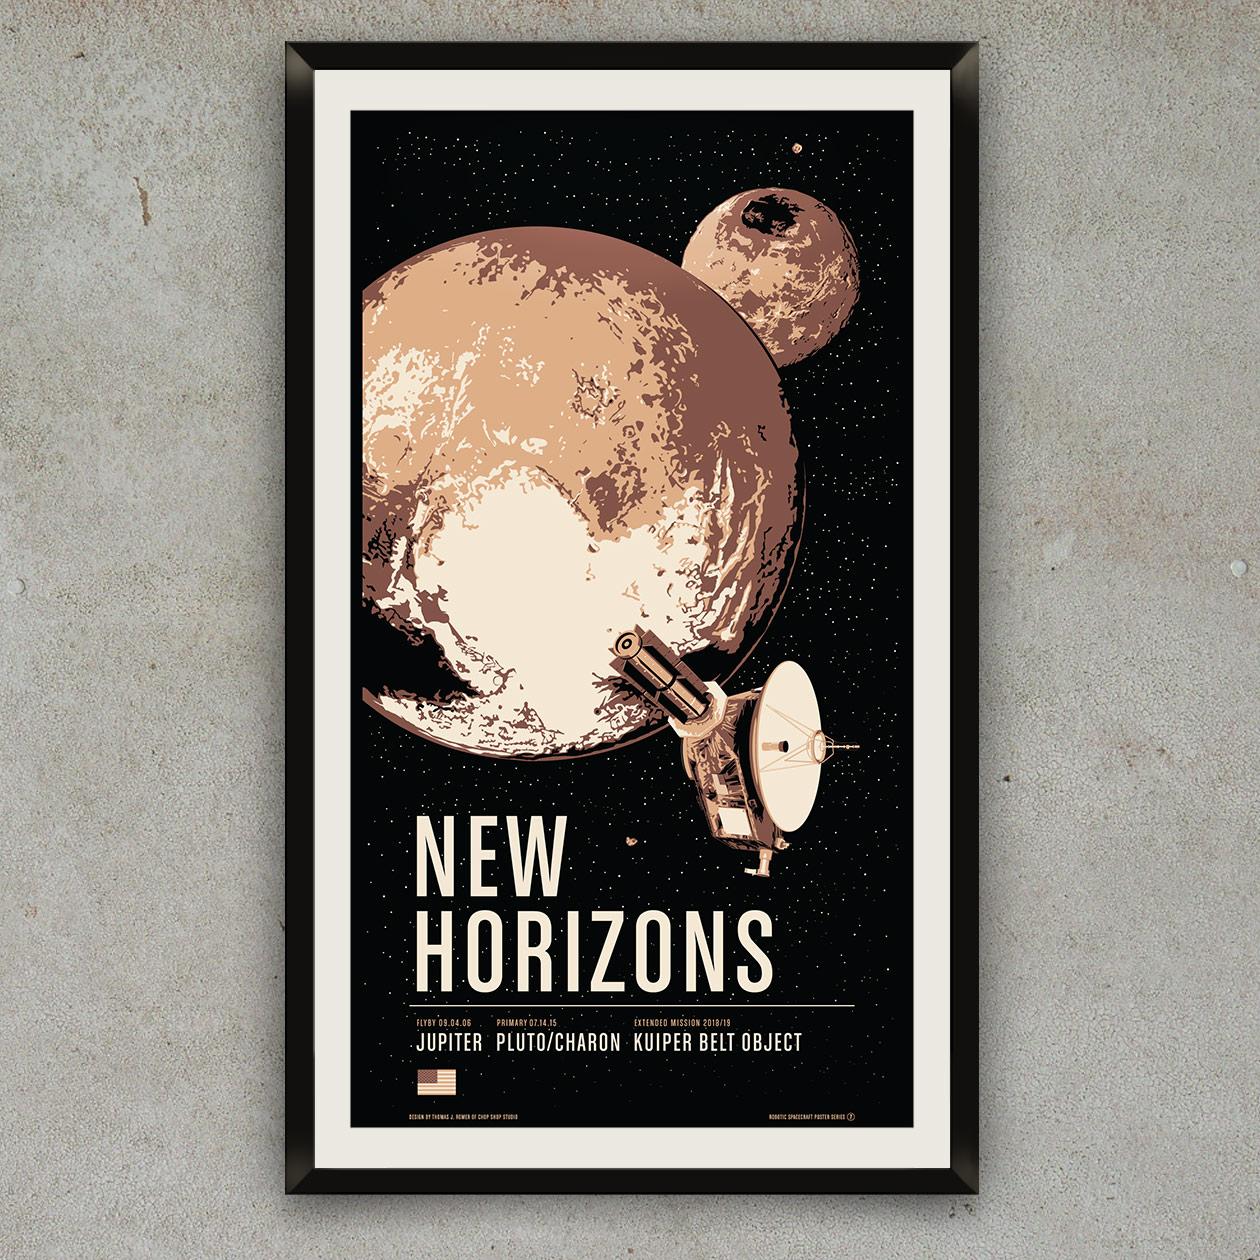 hrss-newhorizons-main-1260.jpg